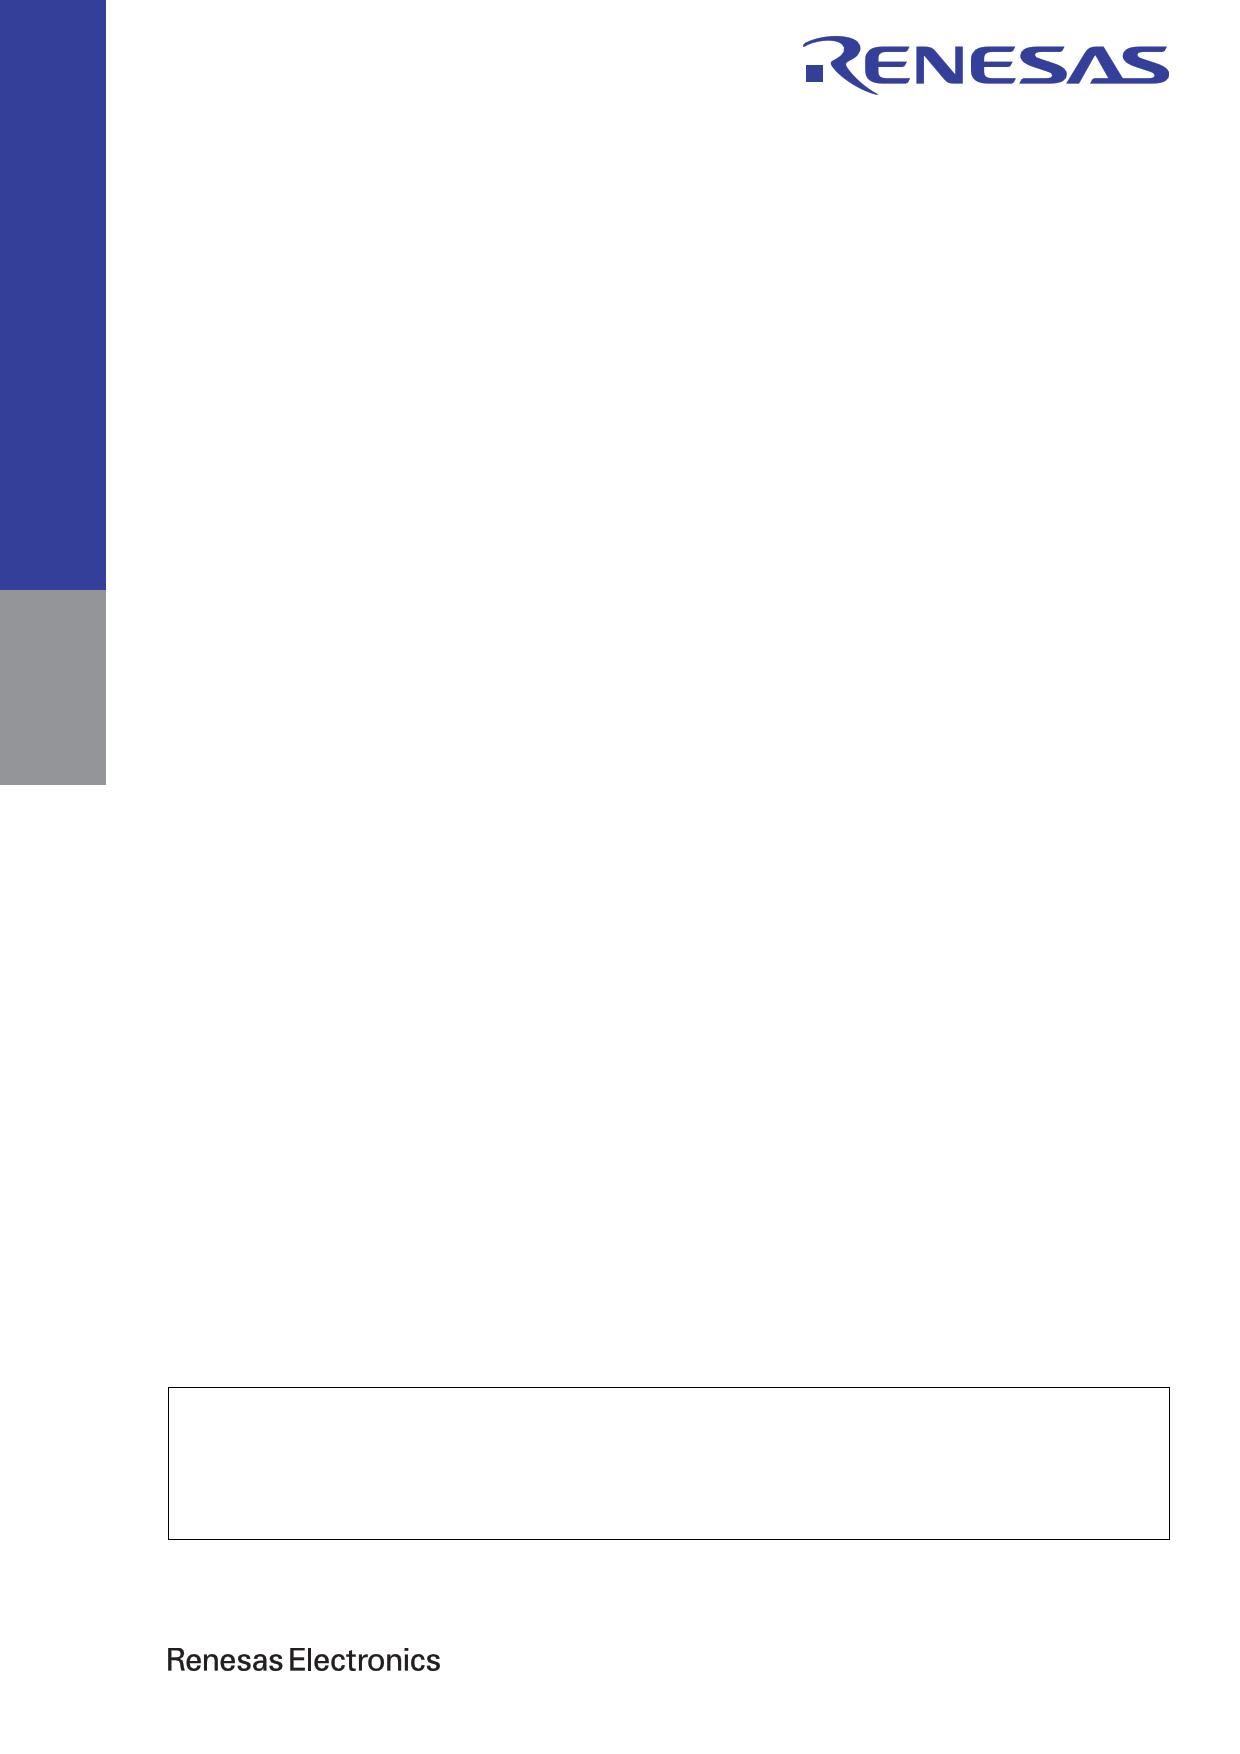 R5F51136ADFM 데이터시트 및 R5F51136ADFM PDF